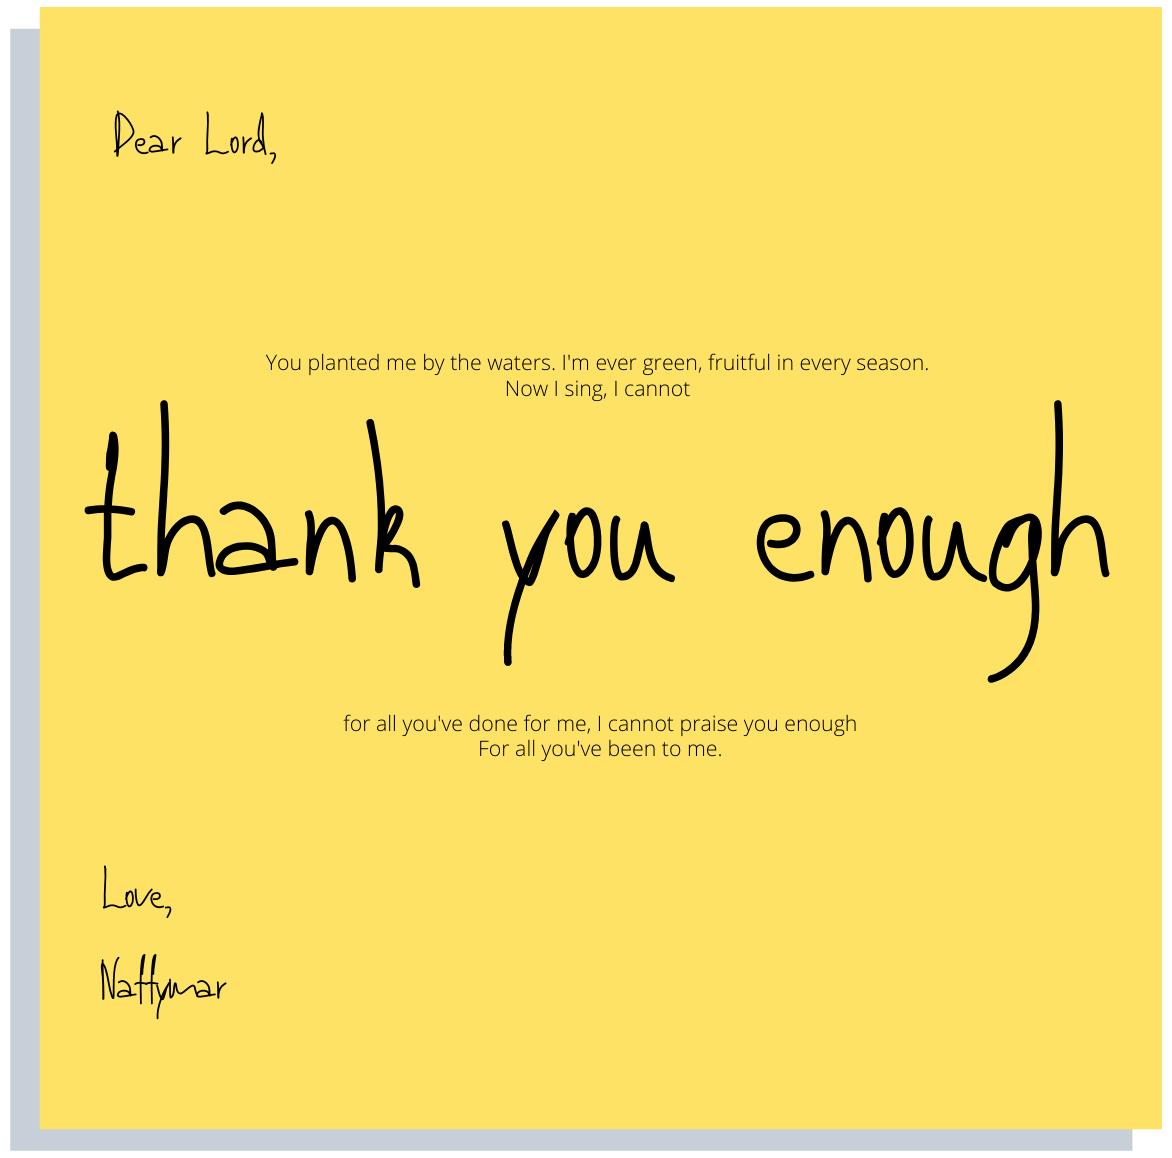 Naffymar - Thank you enough